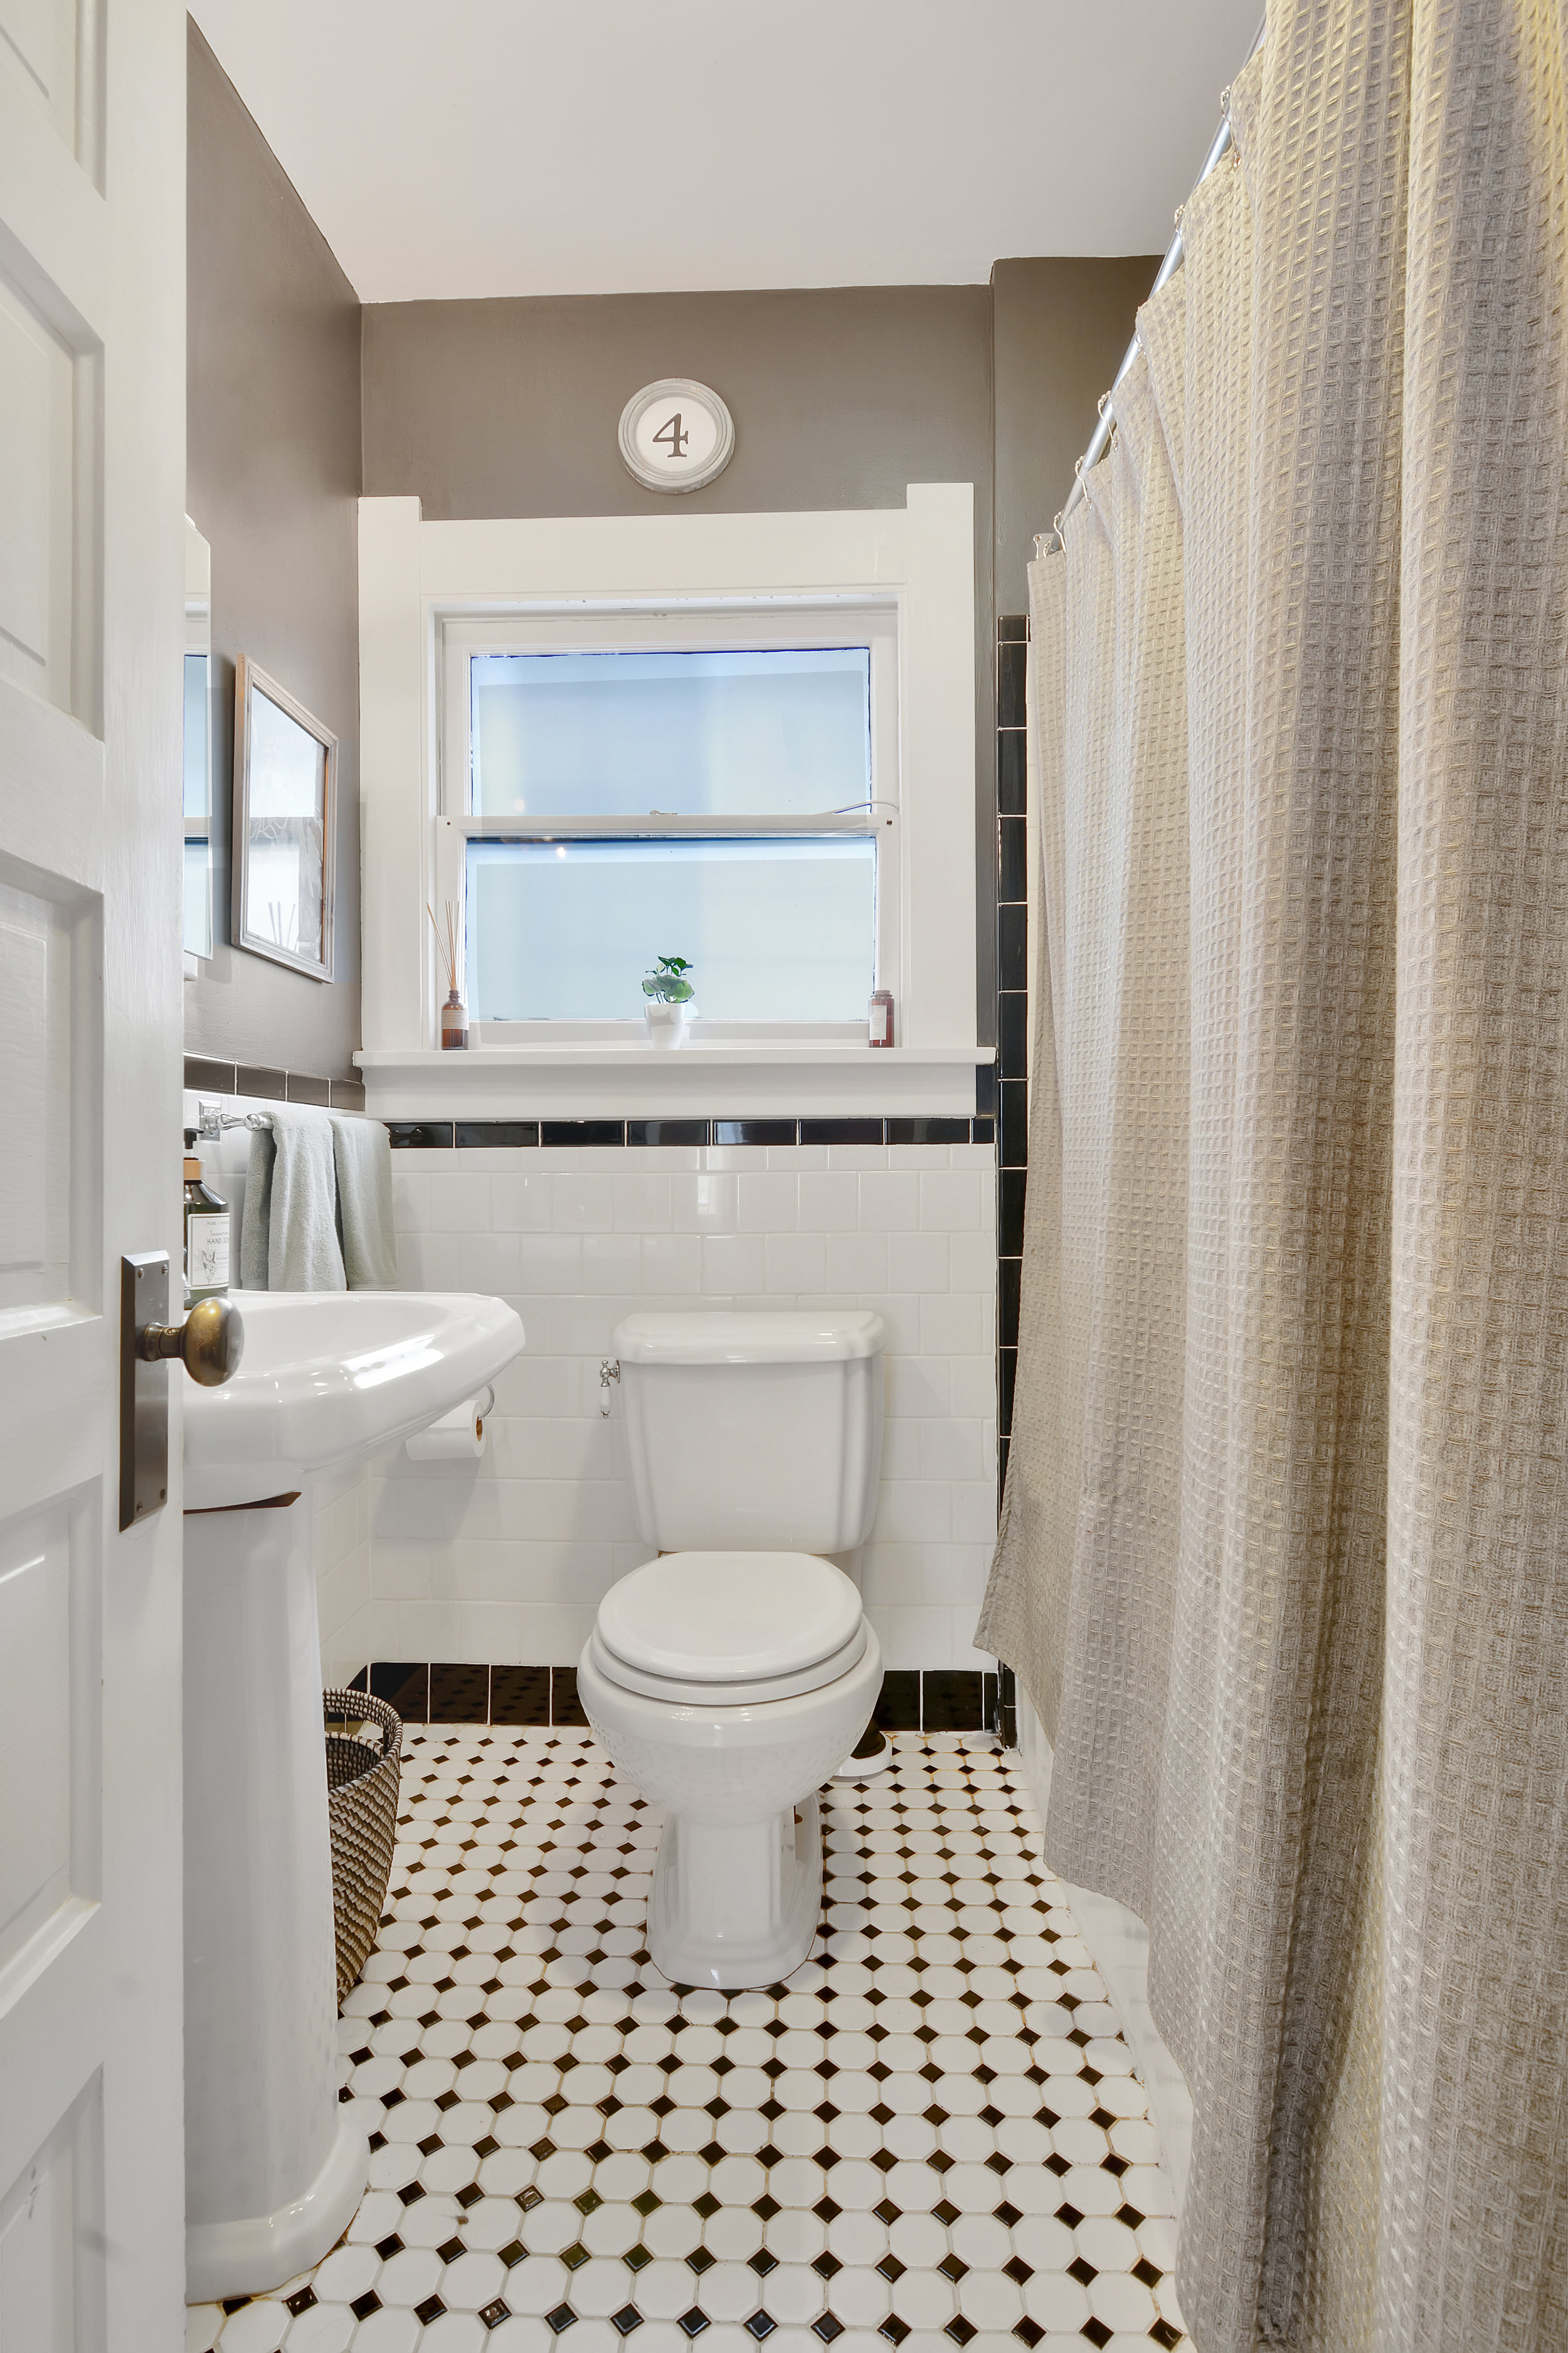 We love the black and white tile floor!